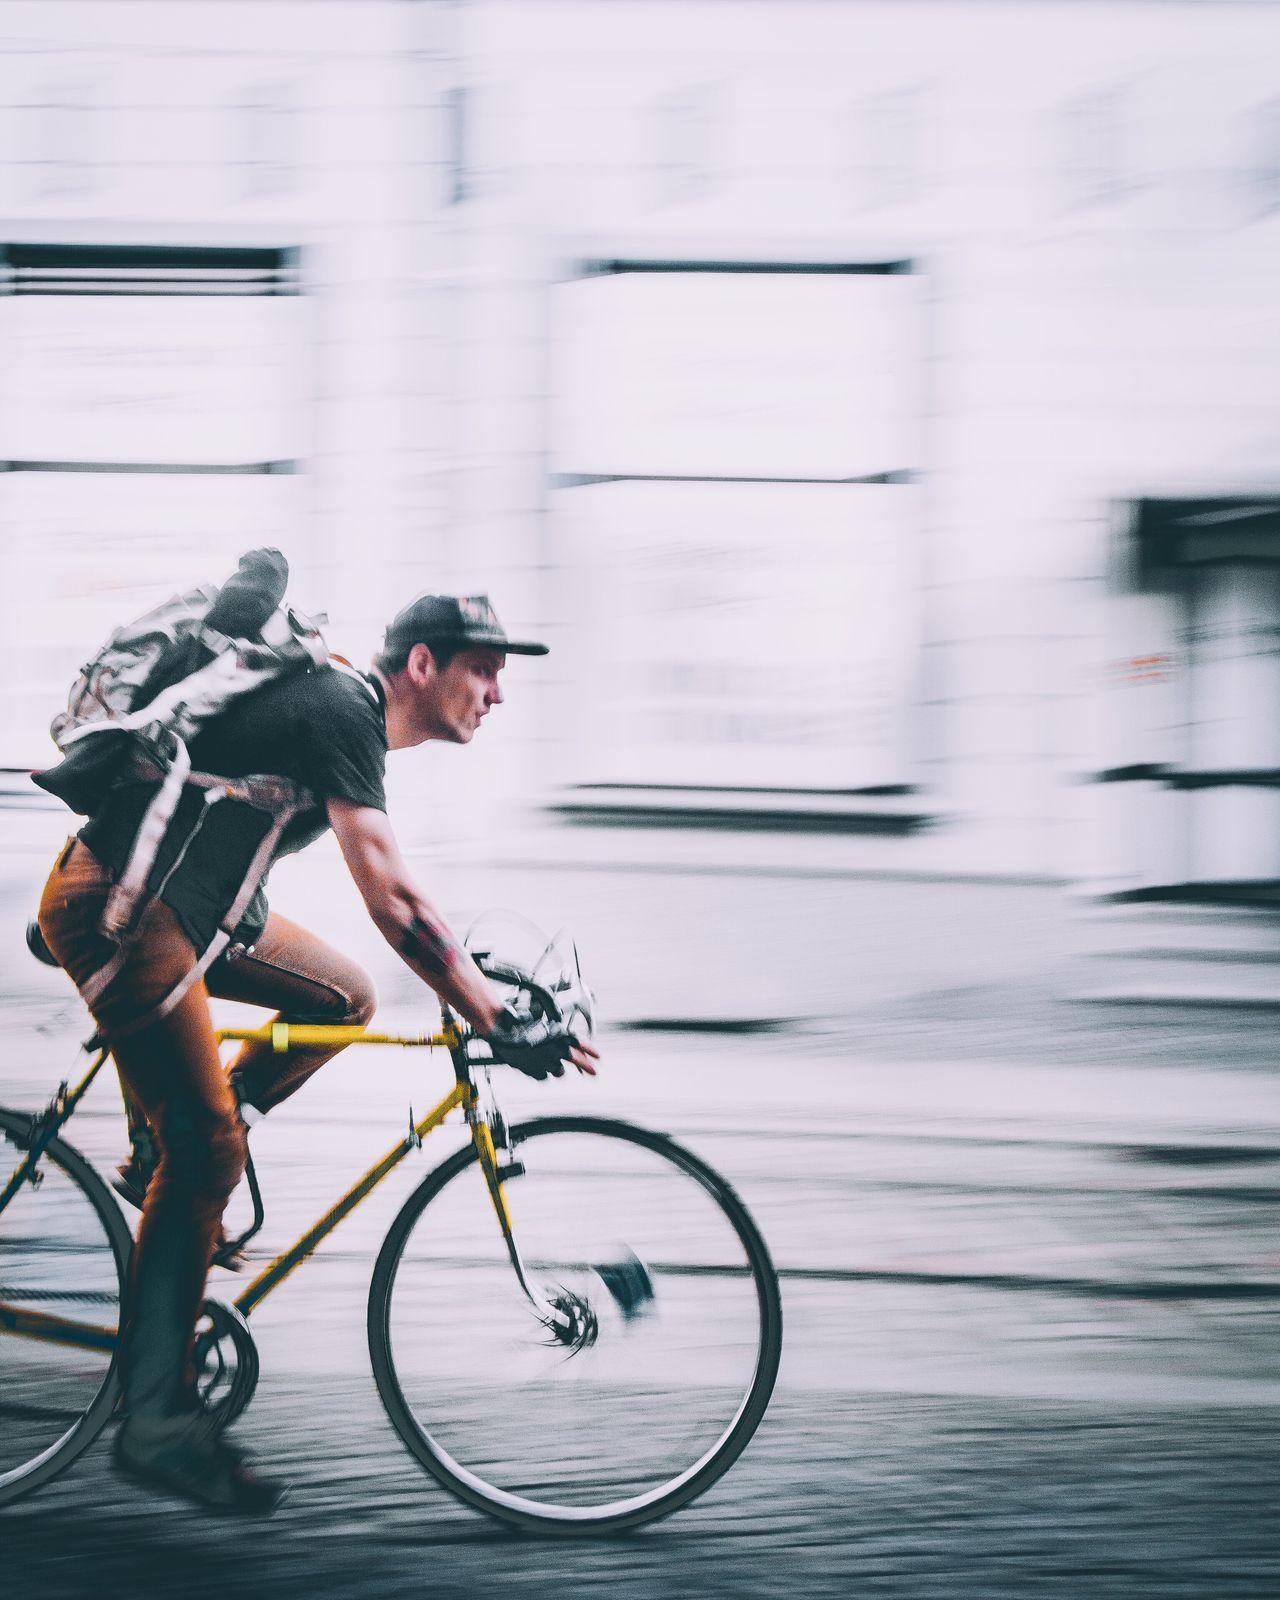 CyclingUnites Transportation Bicycle Mode Of Transport Land Vehicle Leisure Activity On The Move Helmet Motion Lifestyles Road Enjoyment Headwear Travel RISK Men Riding Full Length City Life City Street Crash Helmet